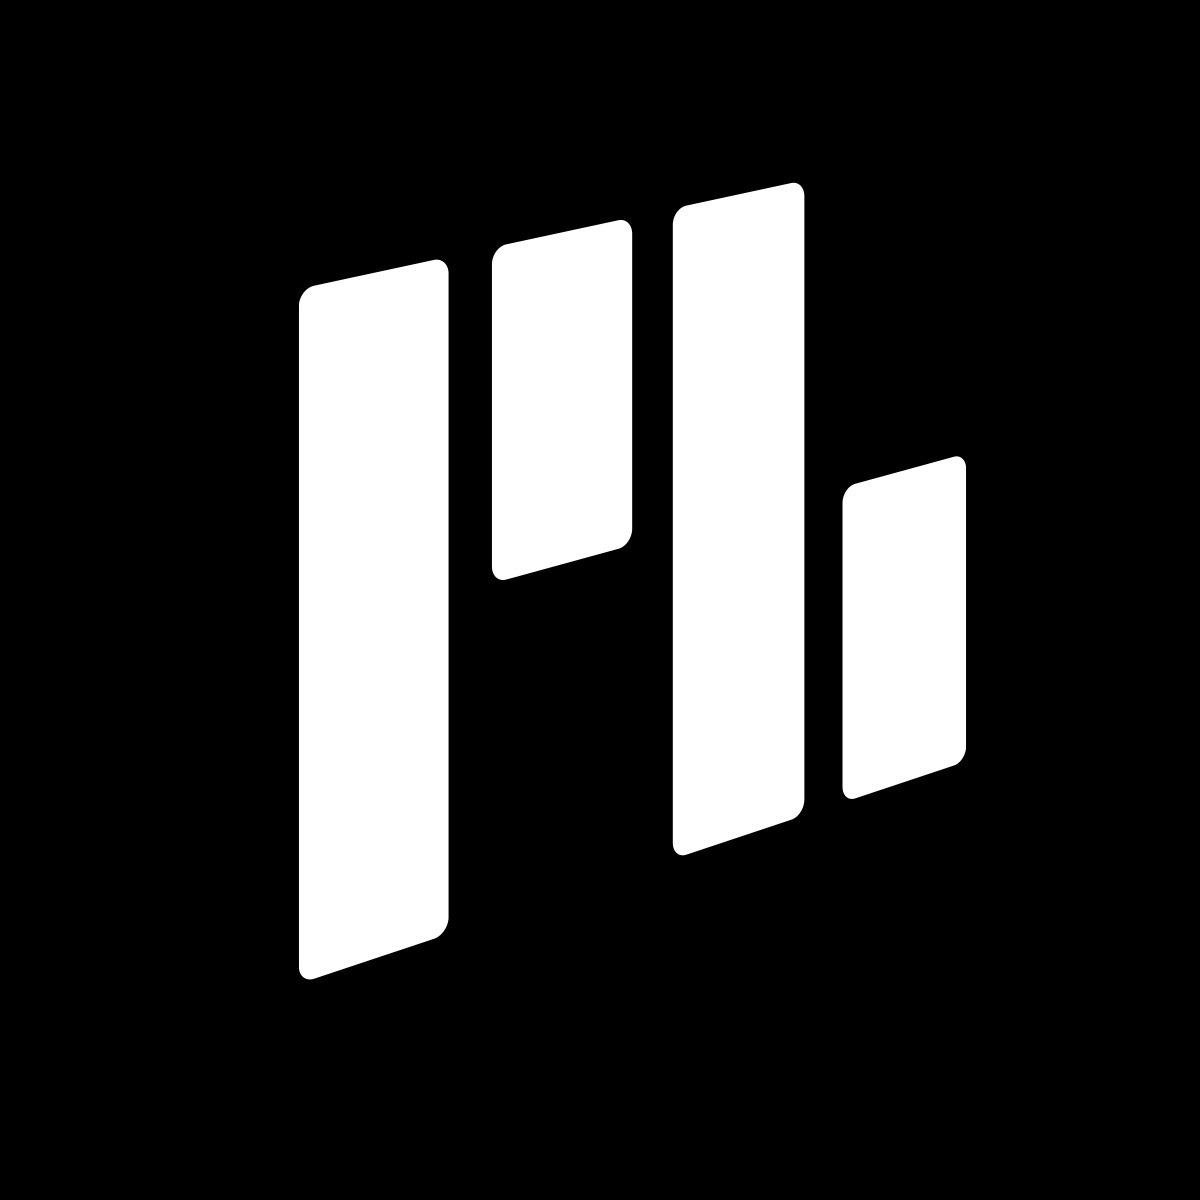 Frontend Developer (m / w / d)